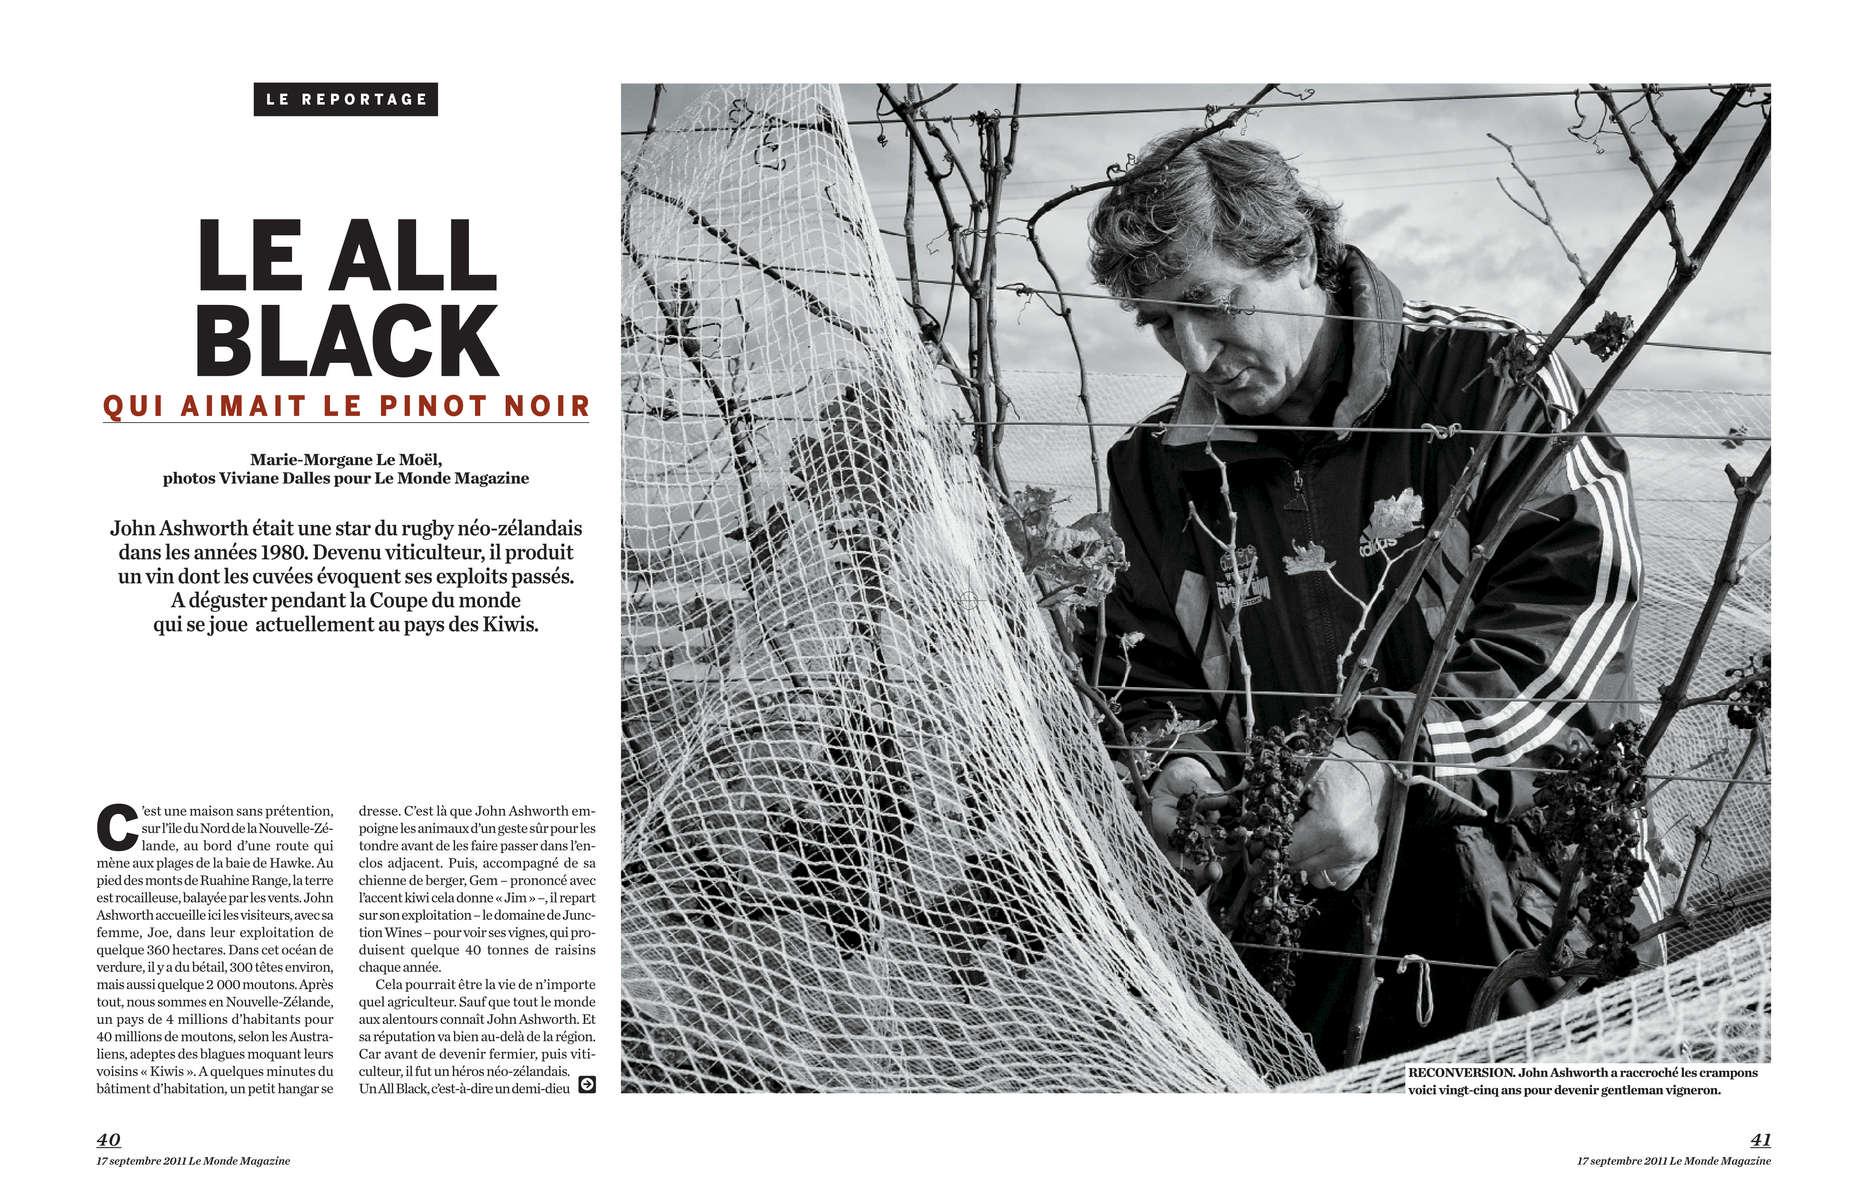 John Ashworth, le All Black devenu vigneron, Nouvelle Zélande, 2011, Article de Morgane Le Moel